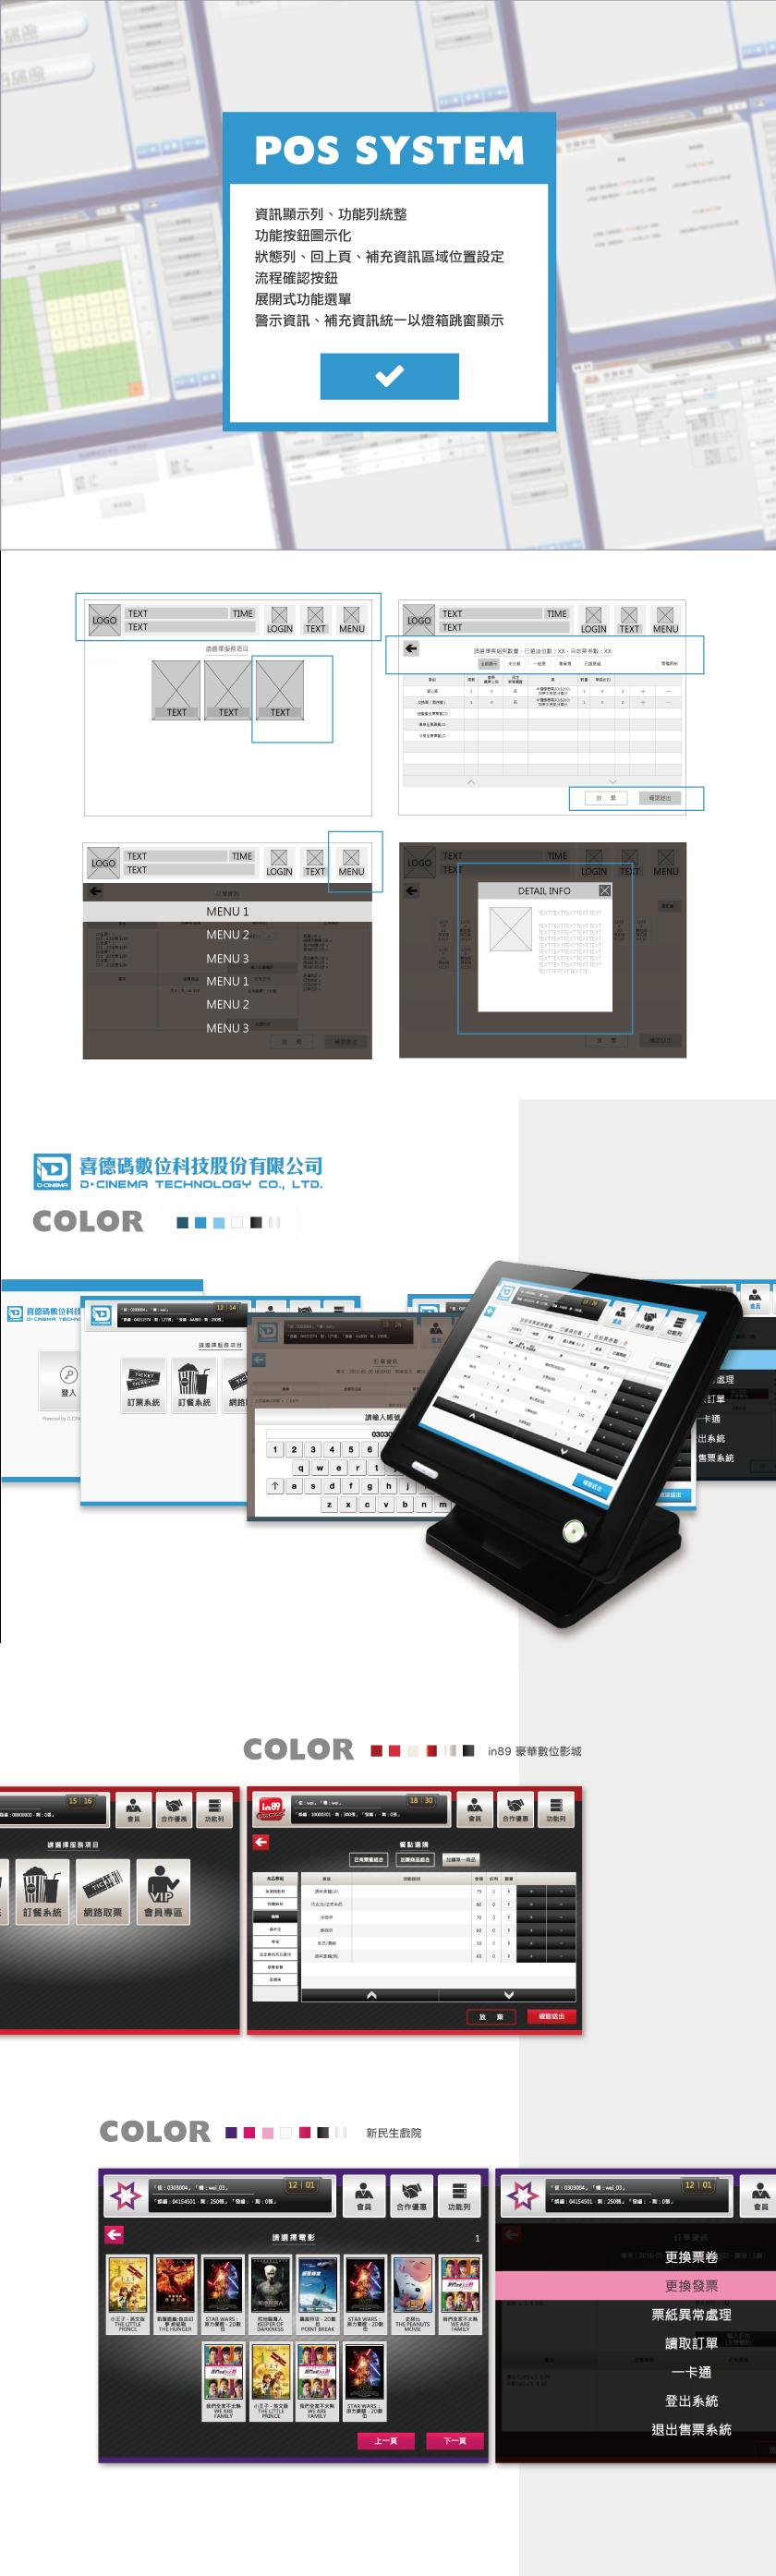 POS-system 介面優化及專案色彩配置